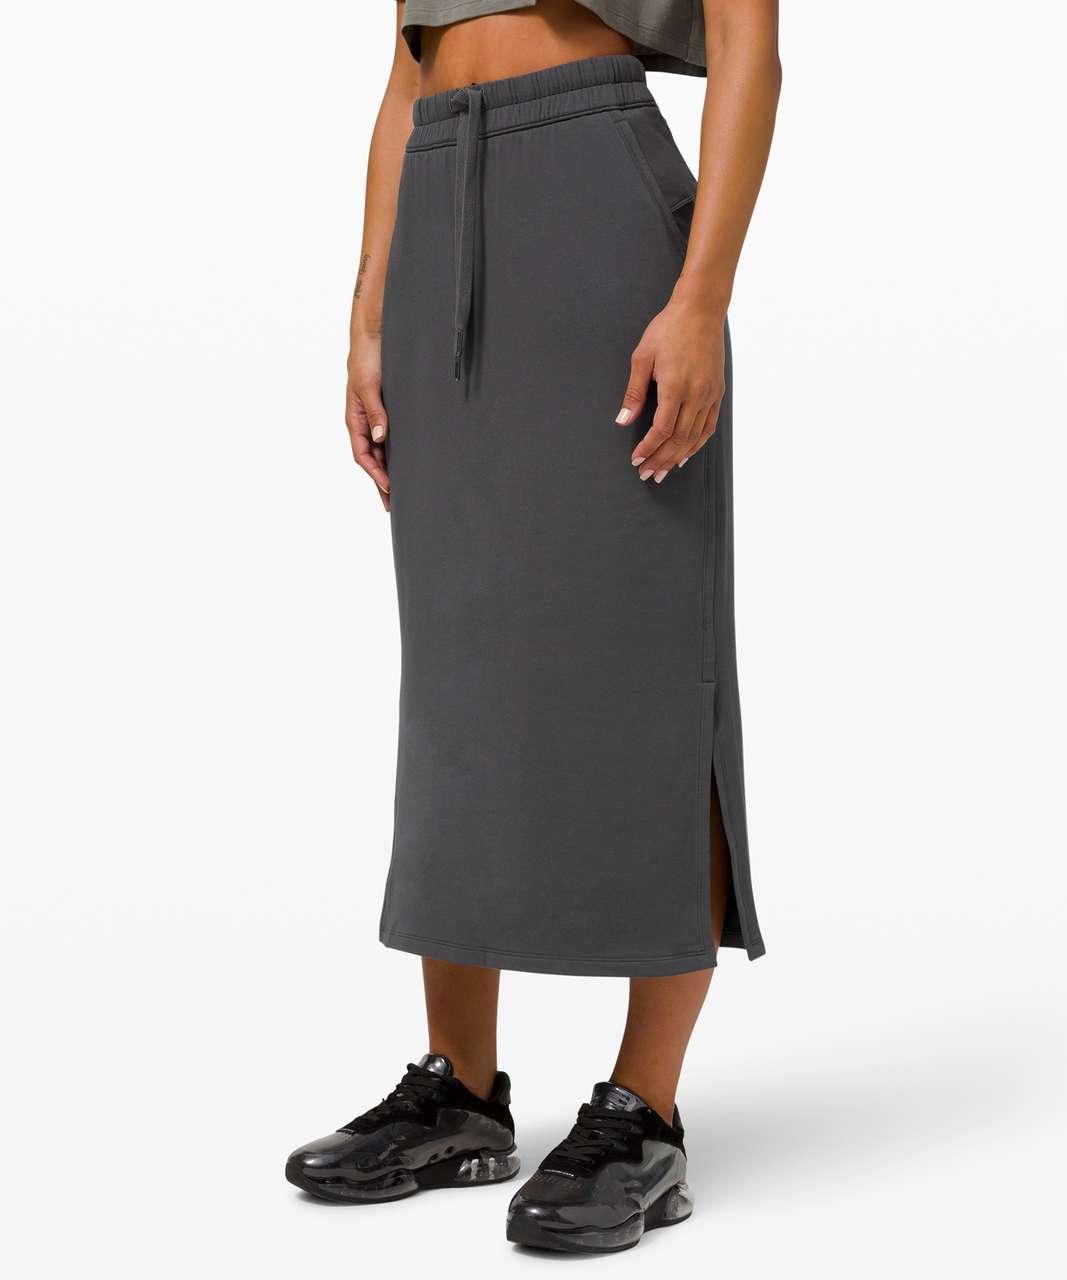 Lululemon Bound to Bliss Skirt - Graphite Grey